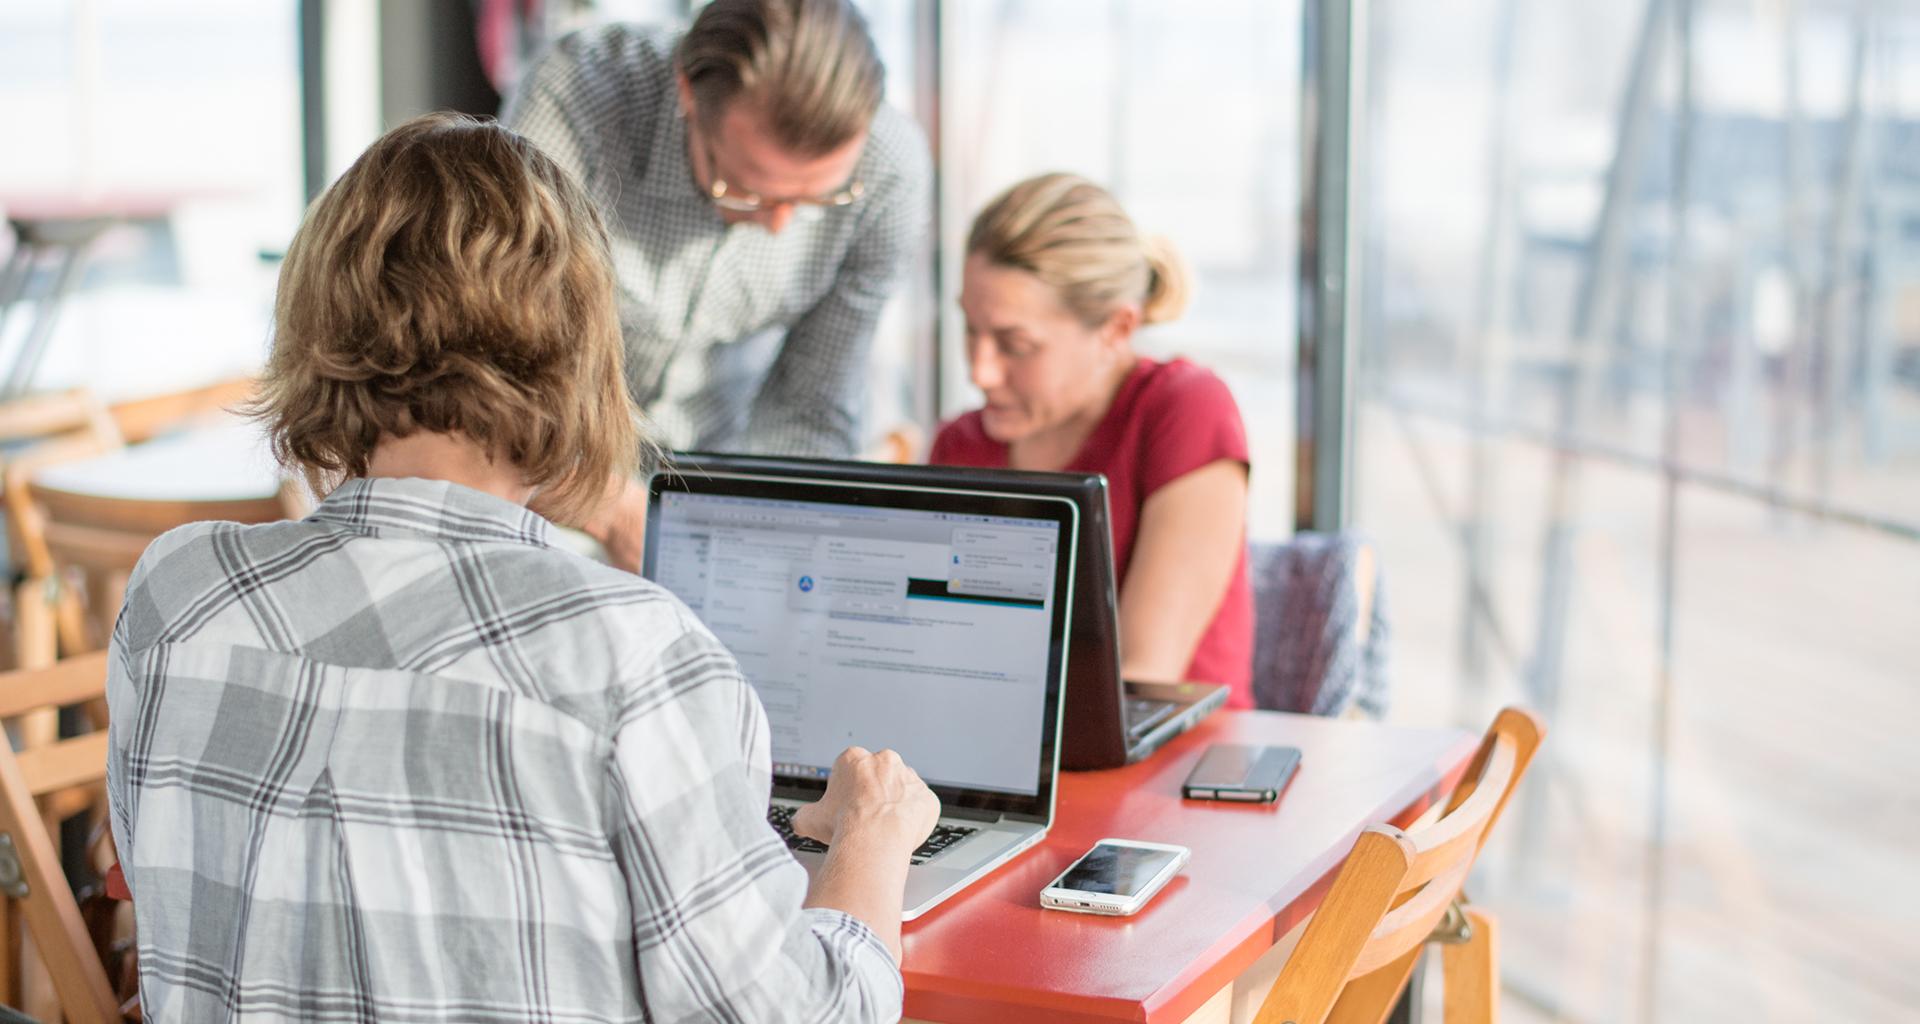 Formation de marketing digital au maroc apprendre en pratiquant